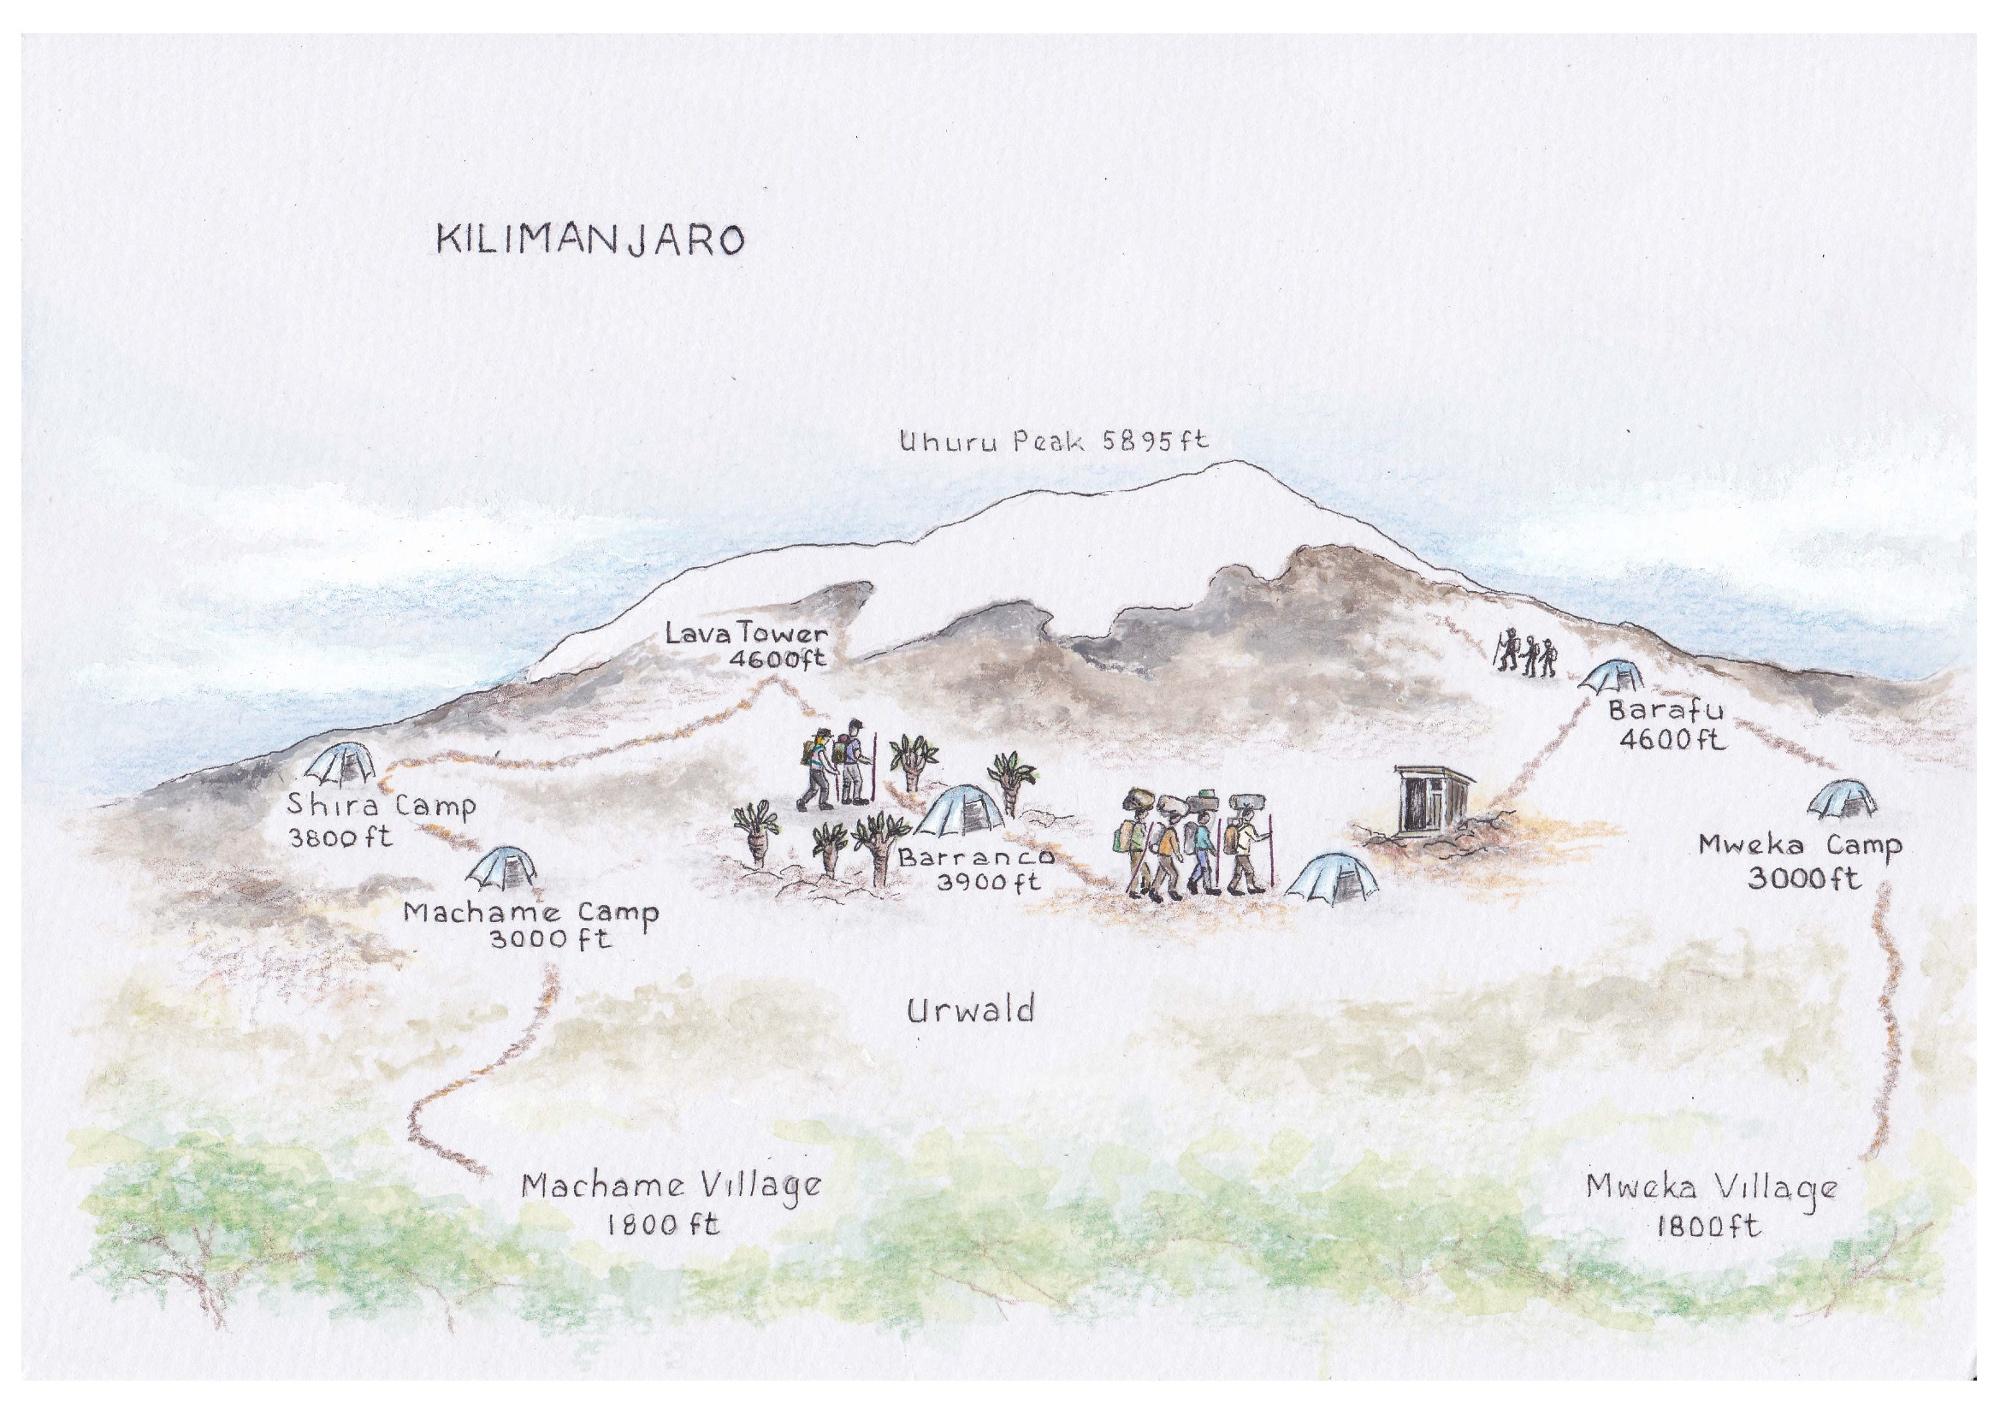 kilimanjaro_map